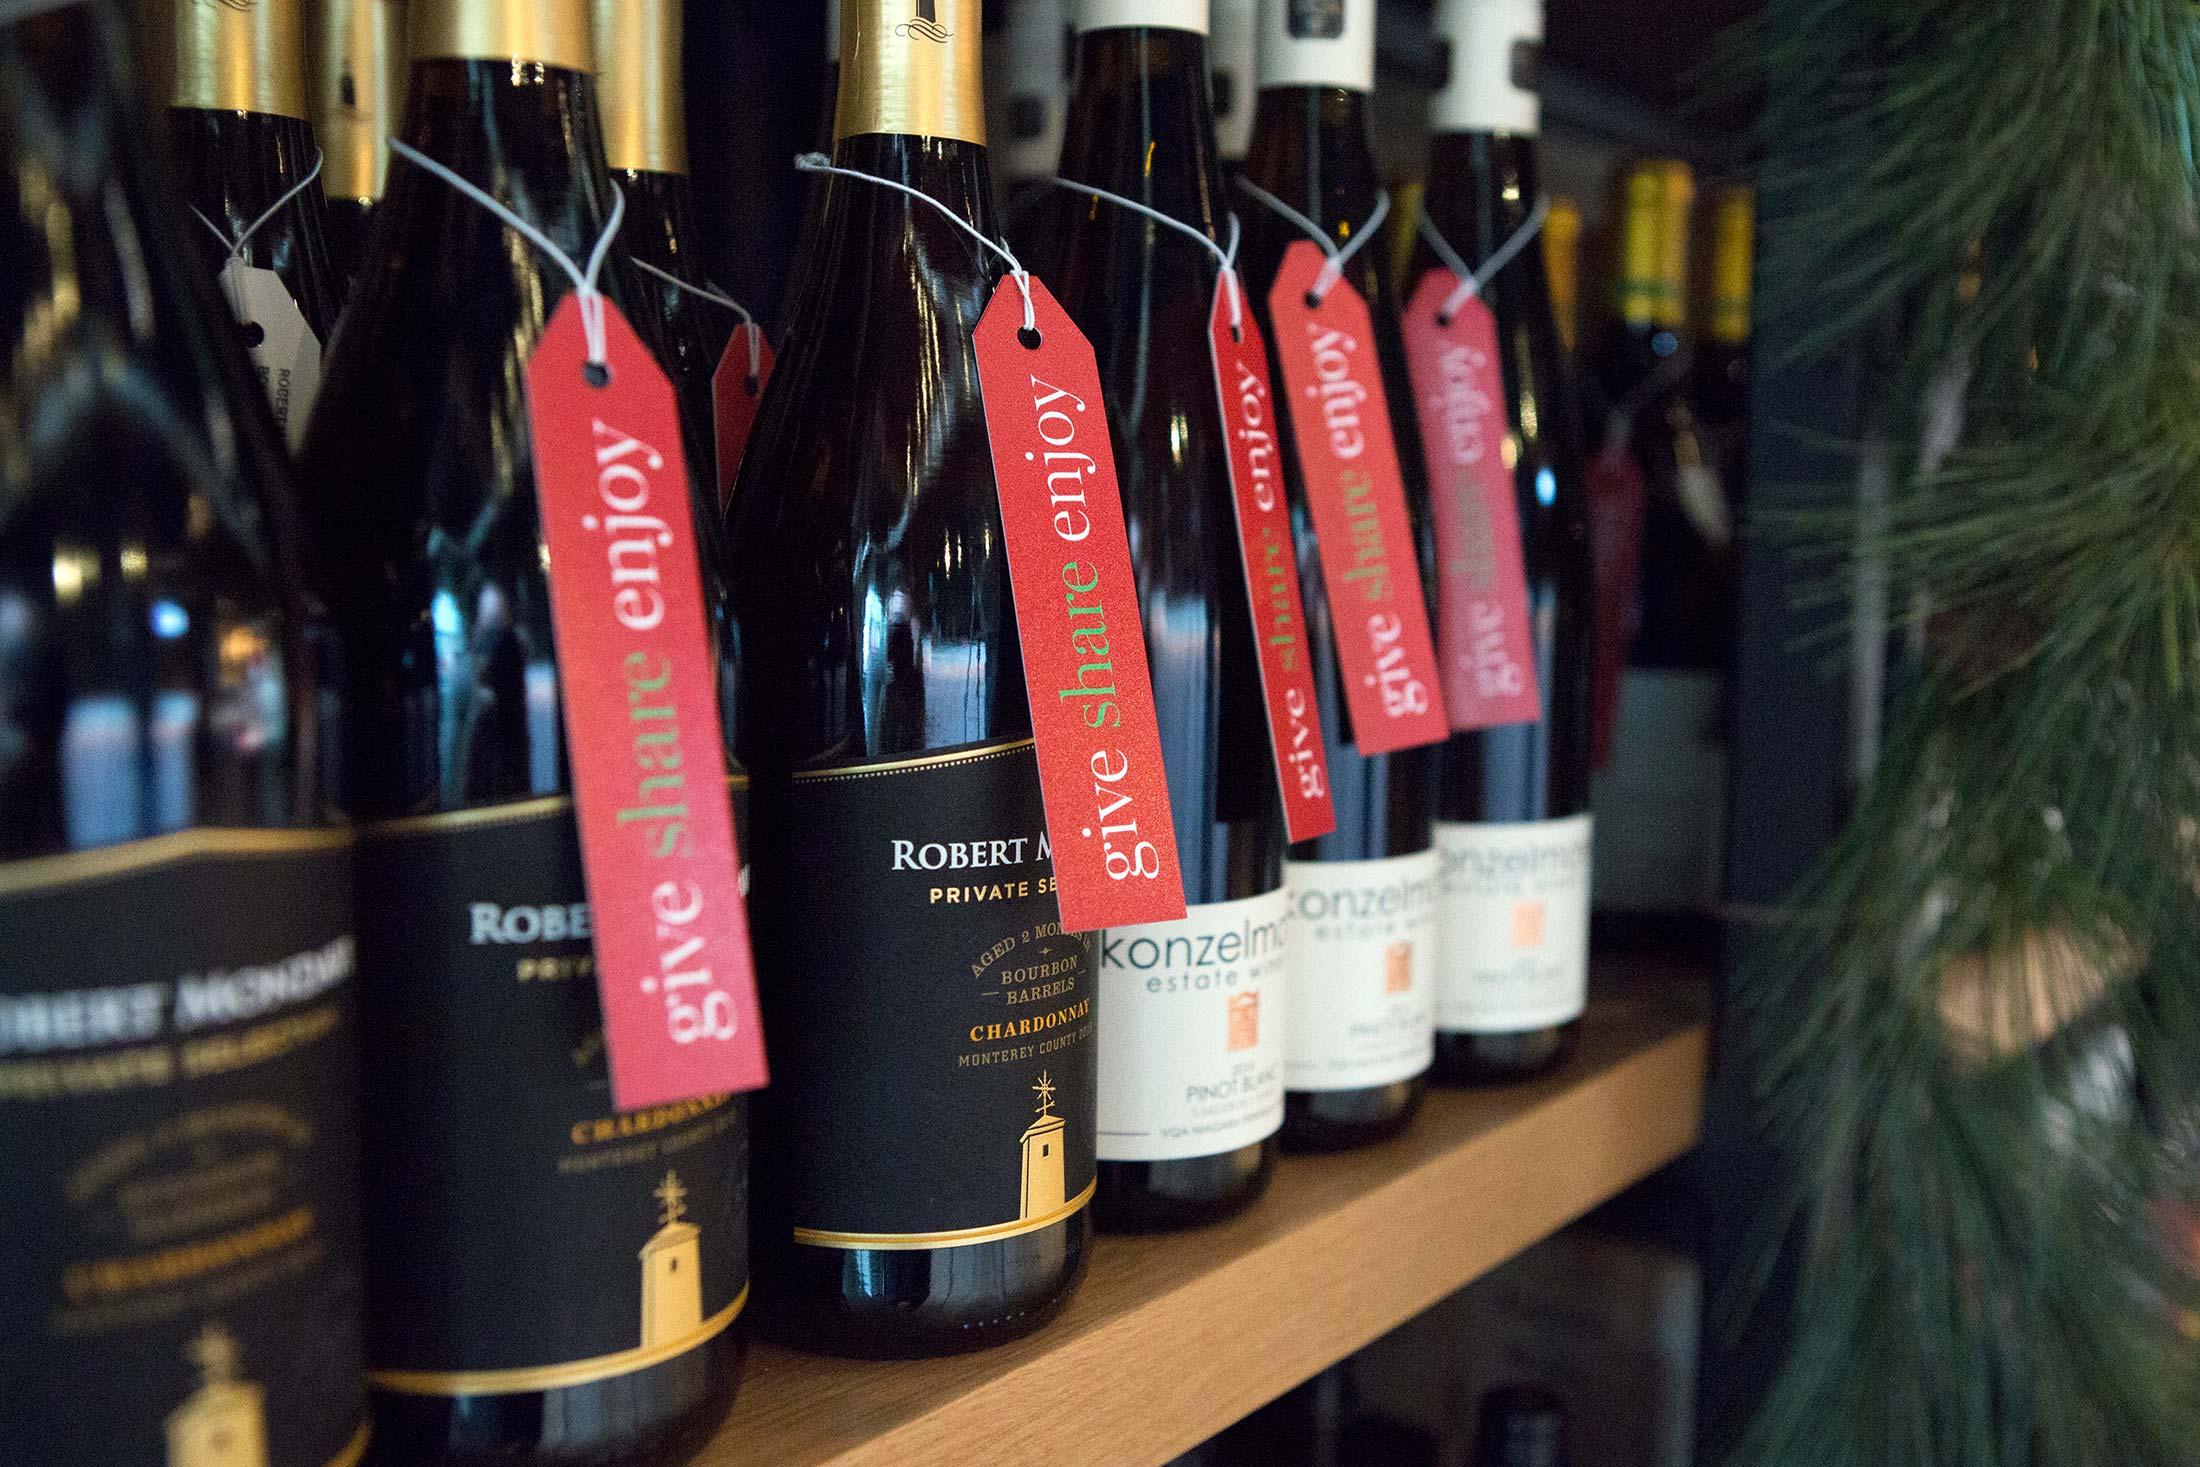 LCBO-holiday-pop-up-gift-tags-wine-bottle-Toronto-Sputnik-Design-Partners.jpg